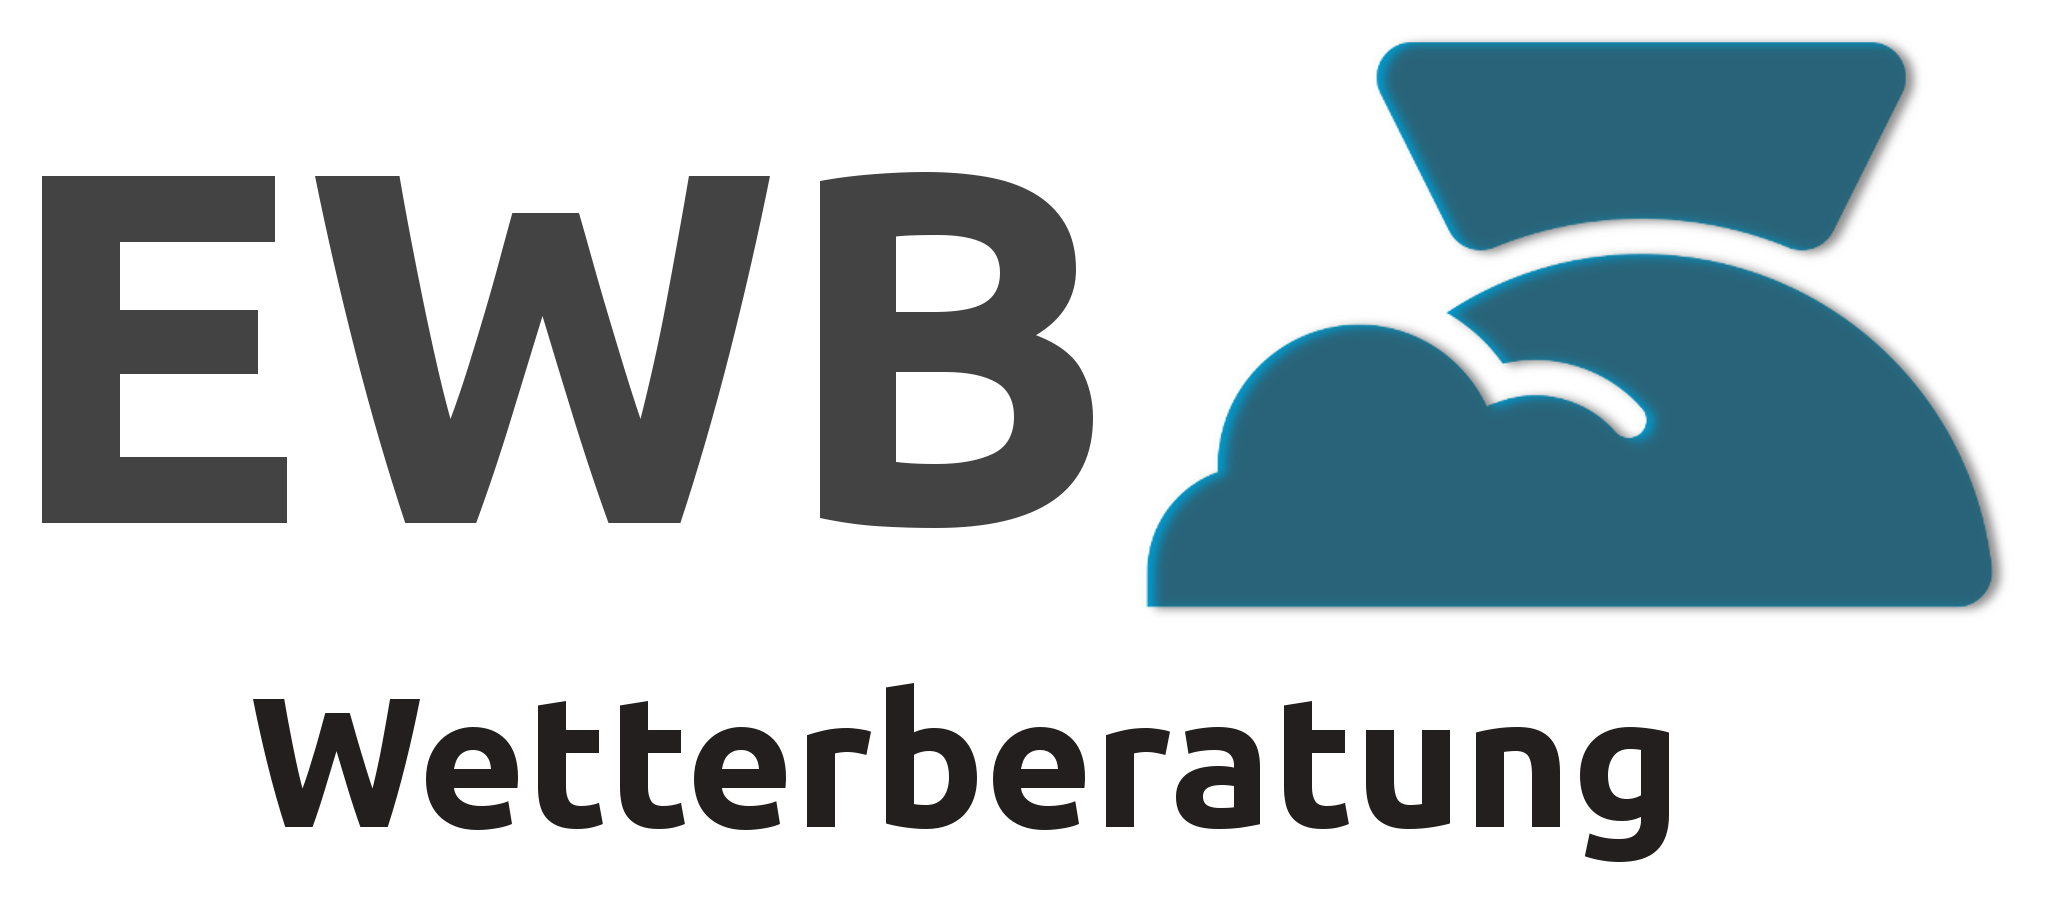 Logo der EWB Wetterberatung